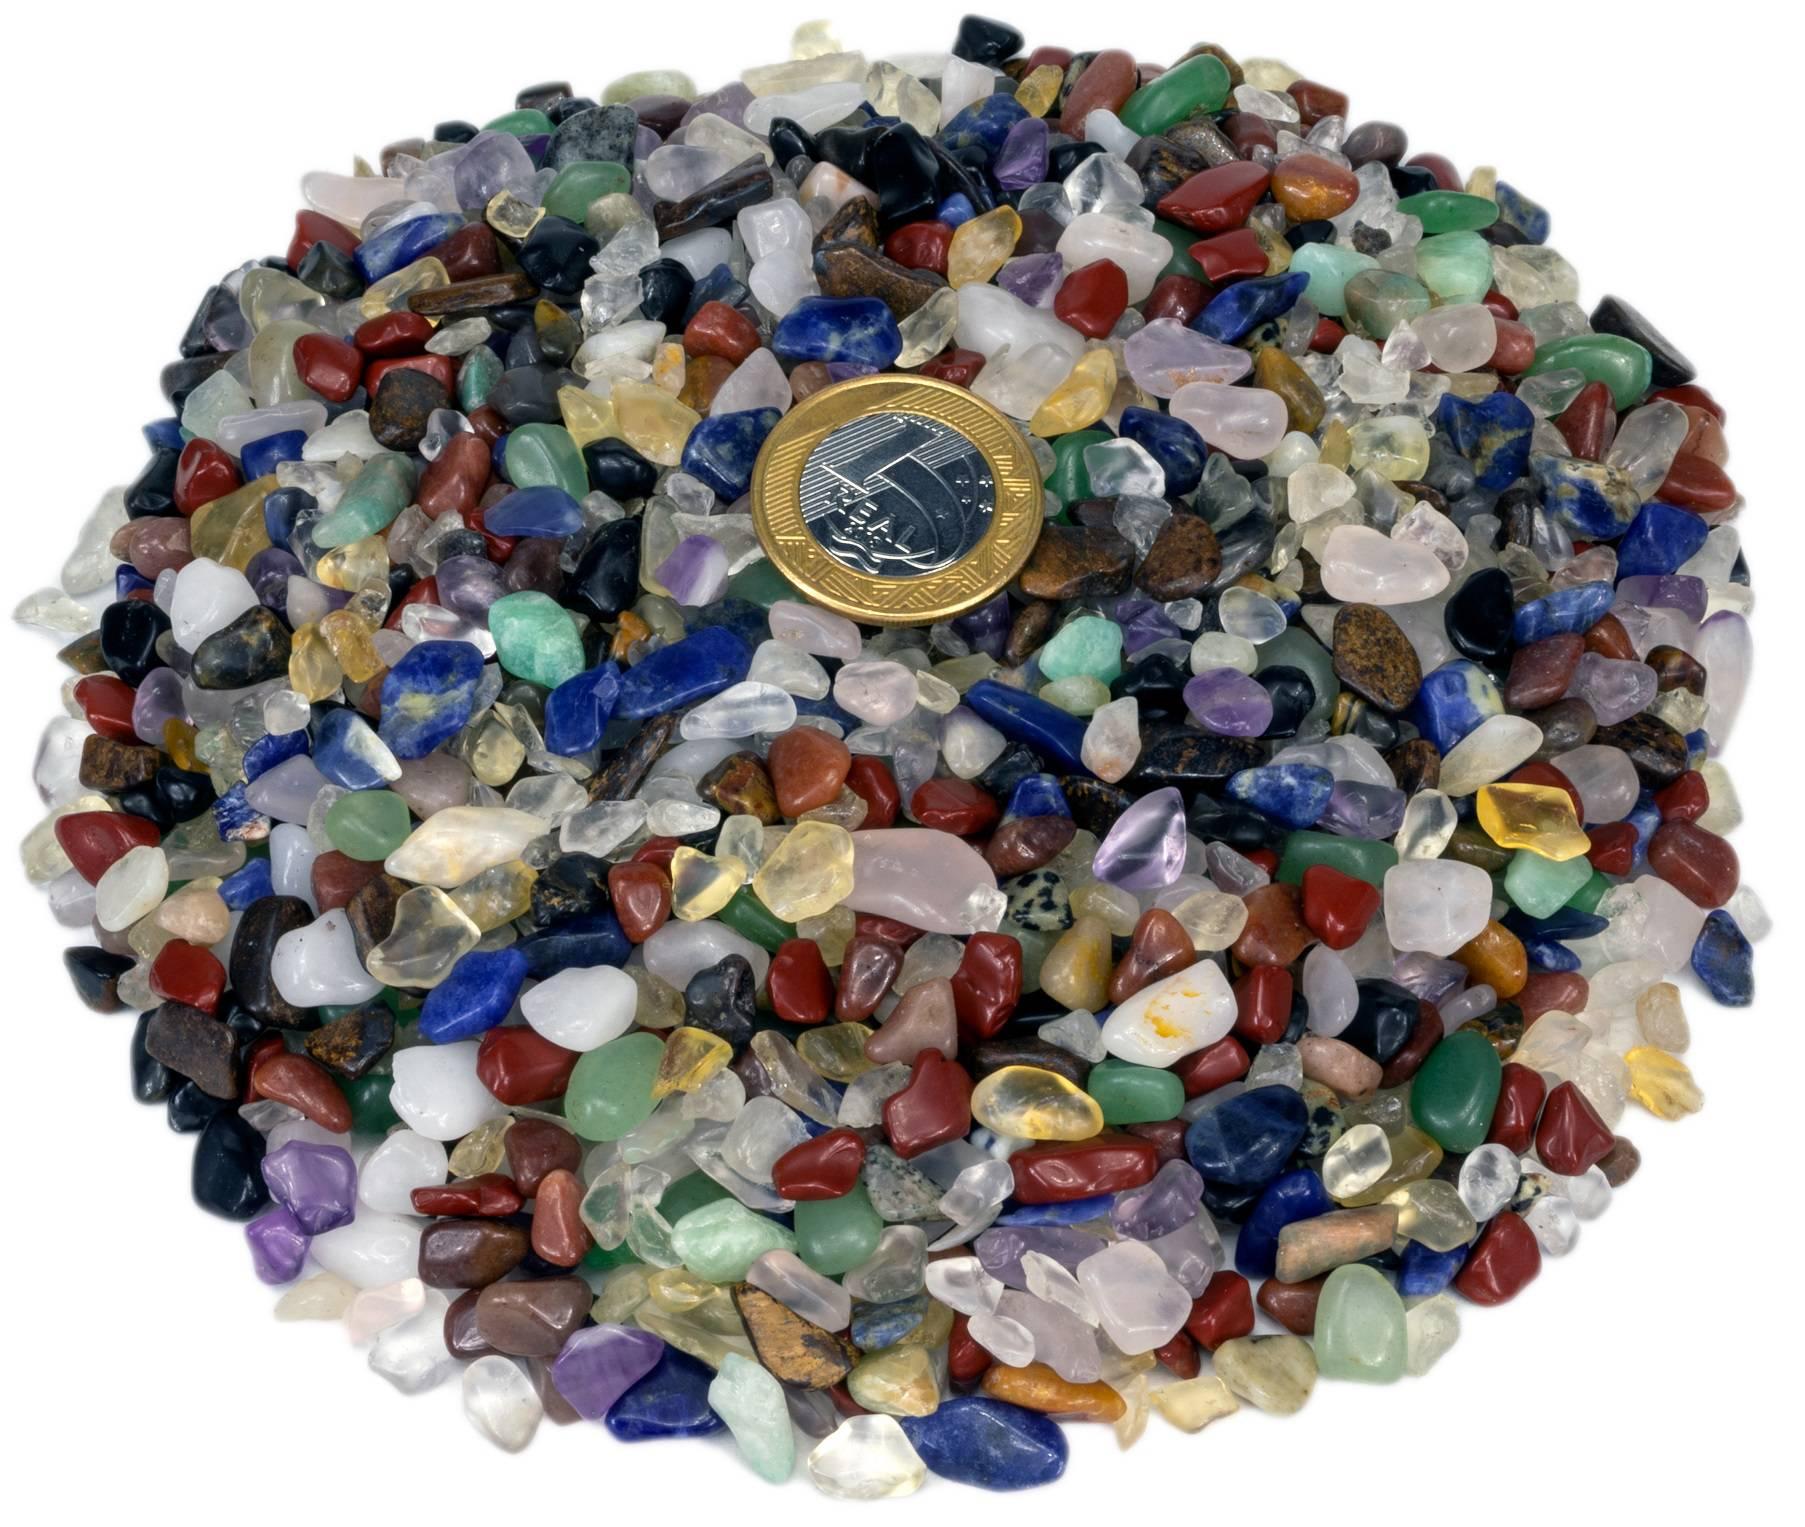 1kg De Cascalho De Pedra Rolada Natural Sortida Mista